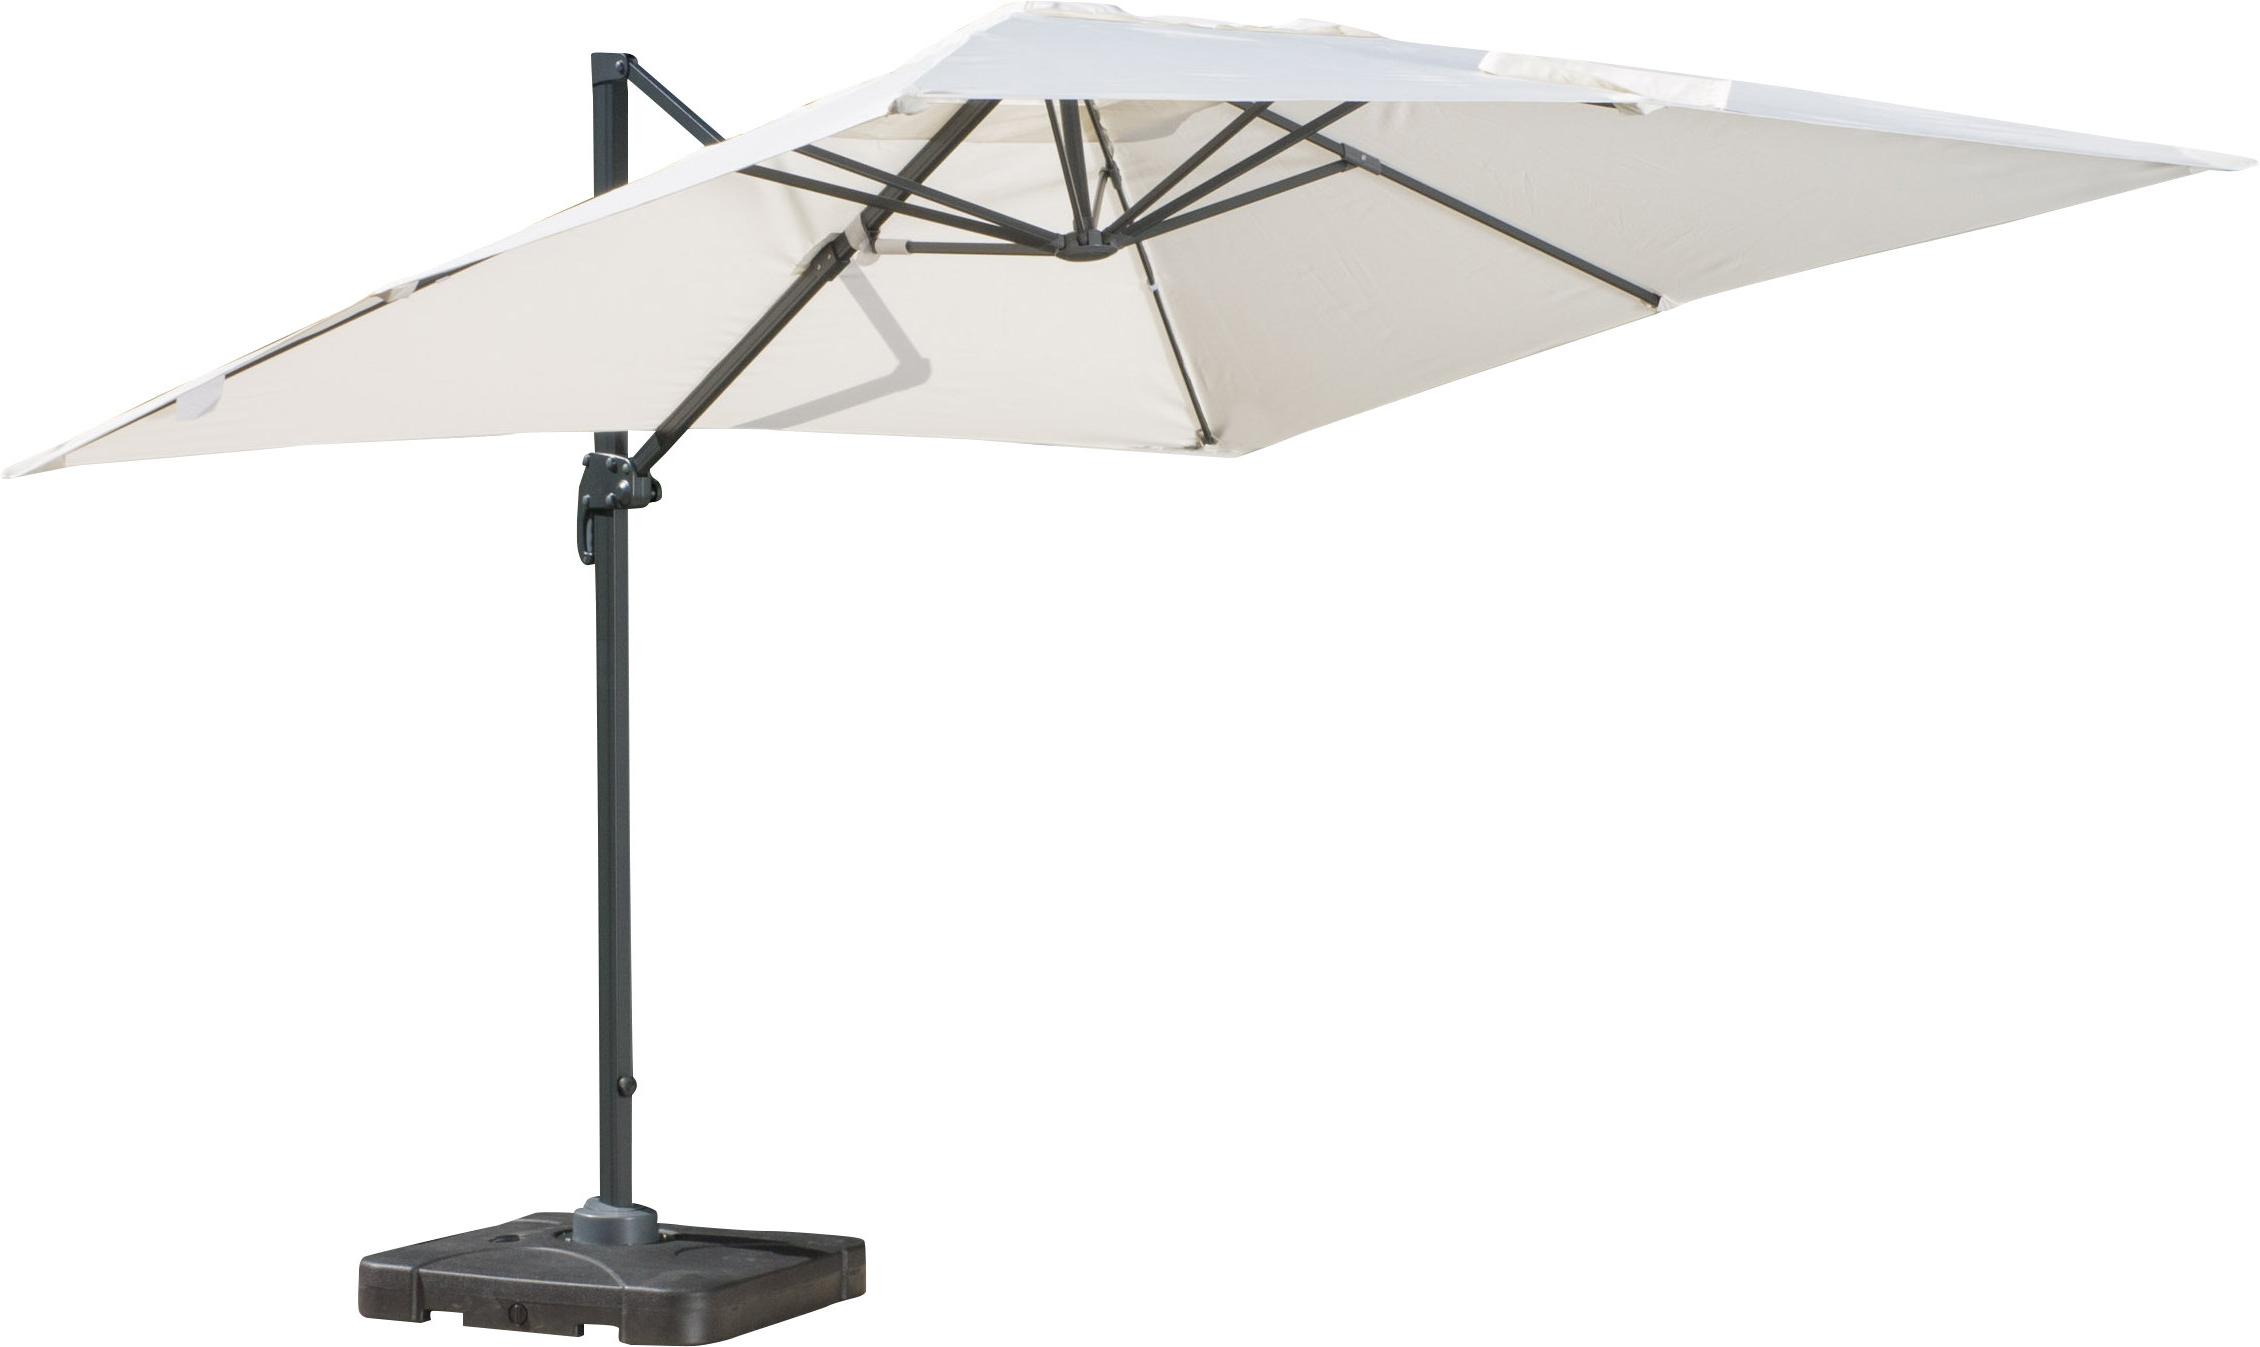 Recent Carlisle Square Cantilever Sunbrella Umbrellas For Boracay 10' Square Cantilever Umbrella (View 18 of 20)